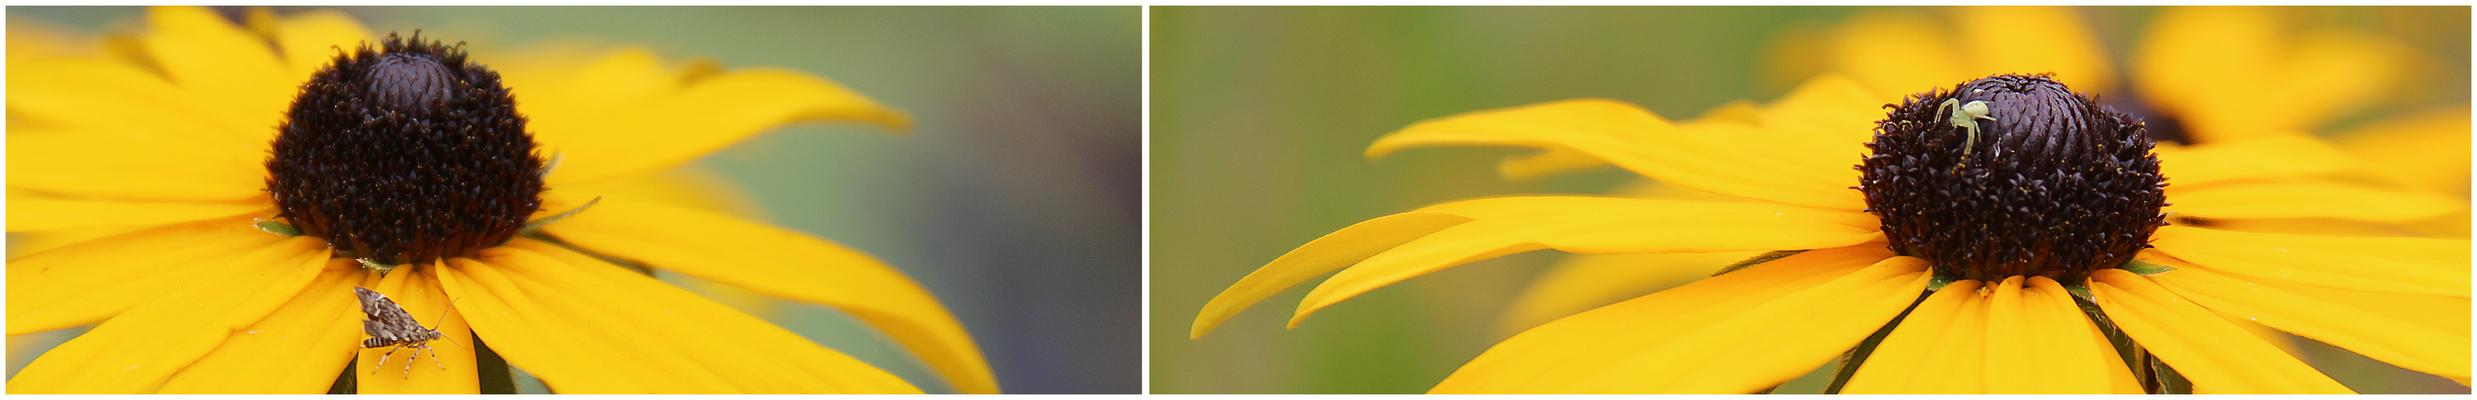 Blüten-Funde.